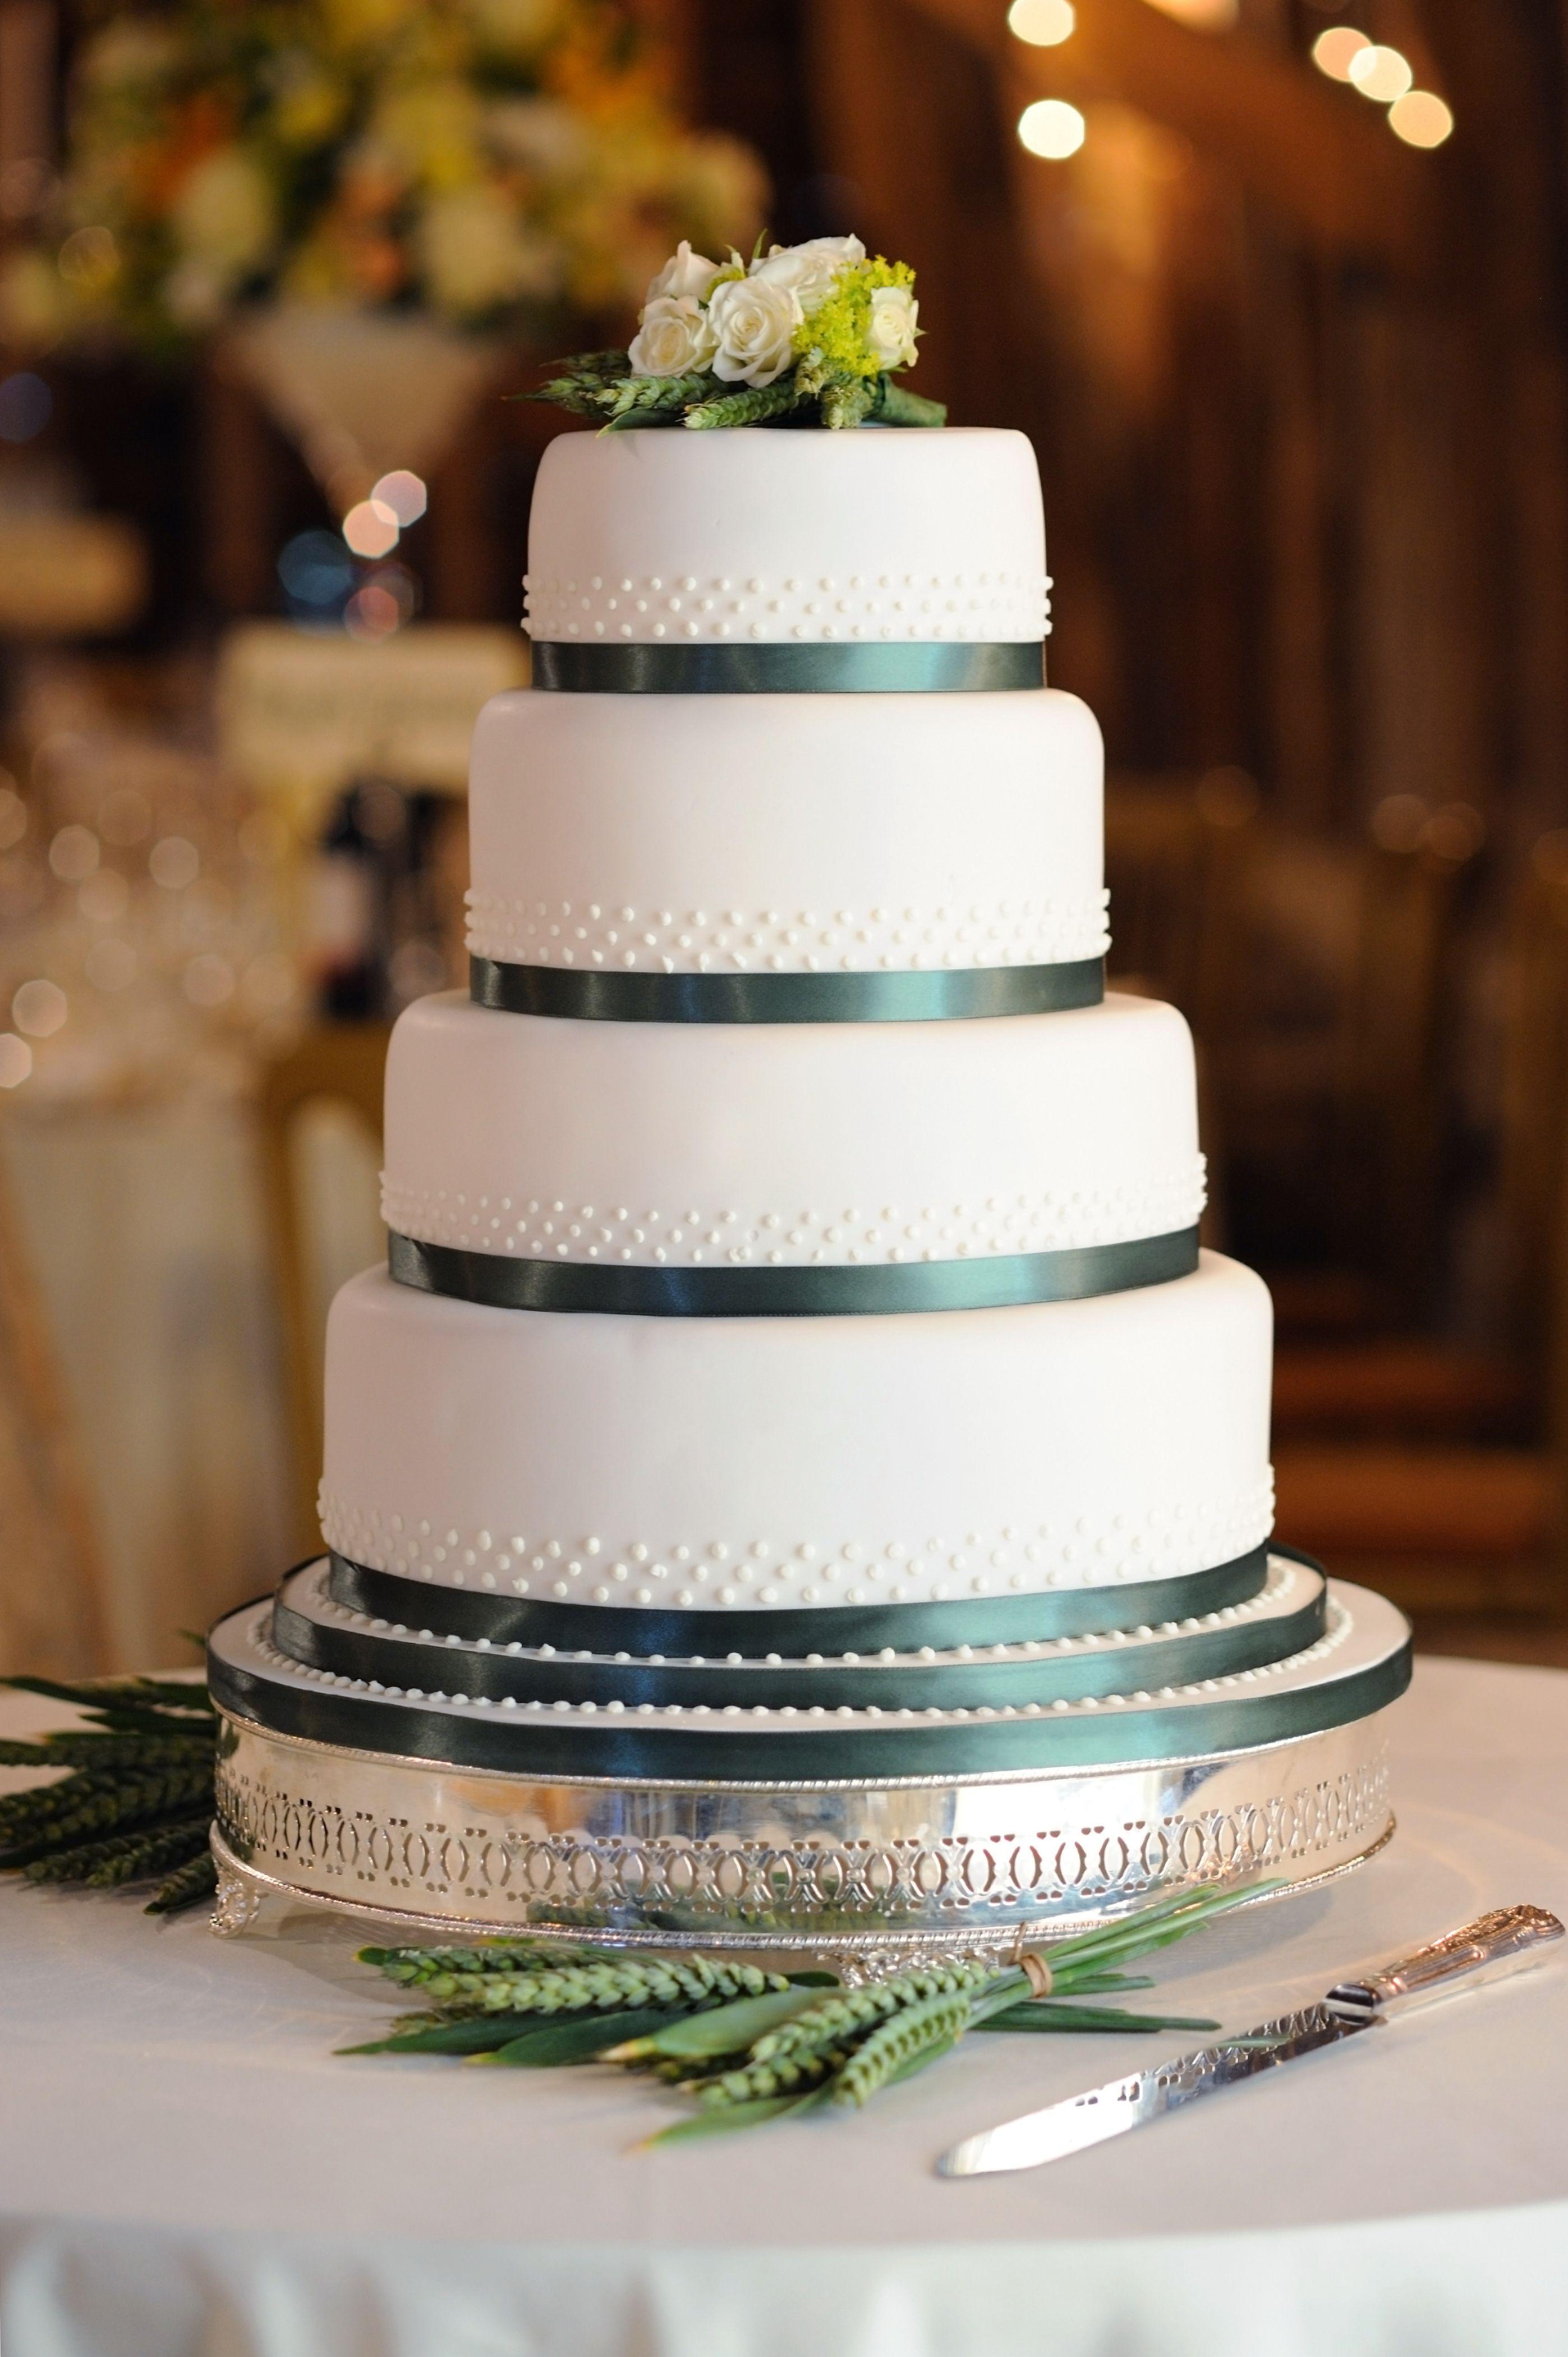 Klassische Hochzeitstorte Mit Dunkelgrunen Elementen Wedding Cakes